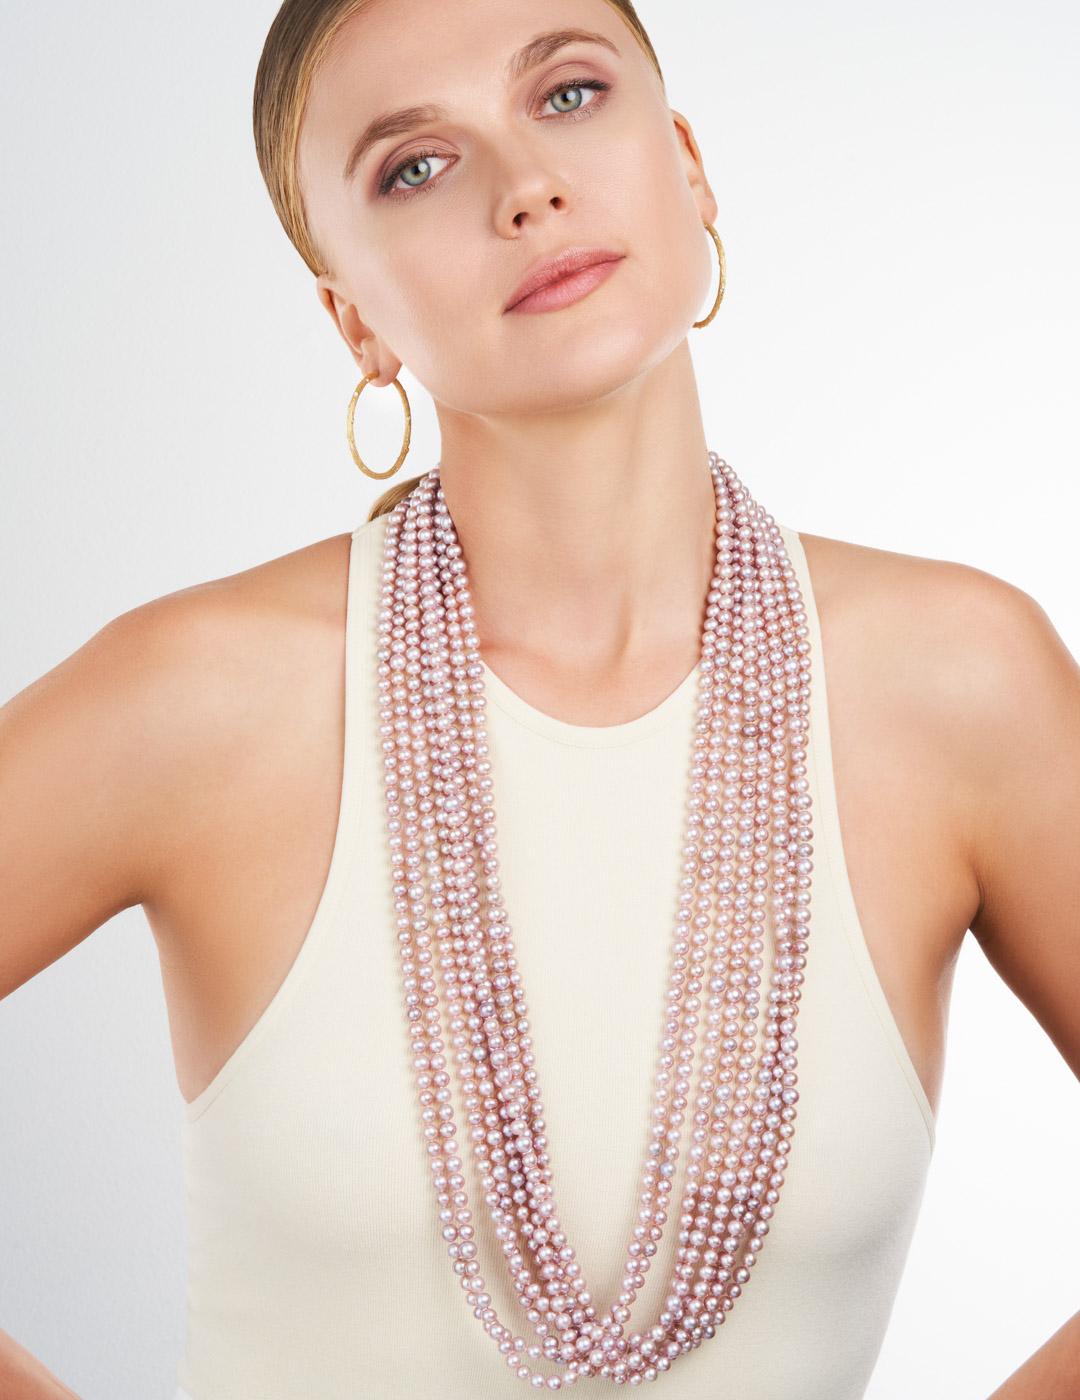 mish_necklaces_Pink Pearl-MultiStrnd-NK-2